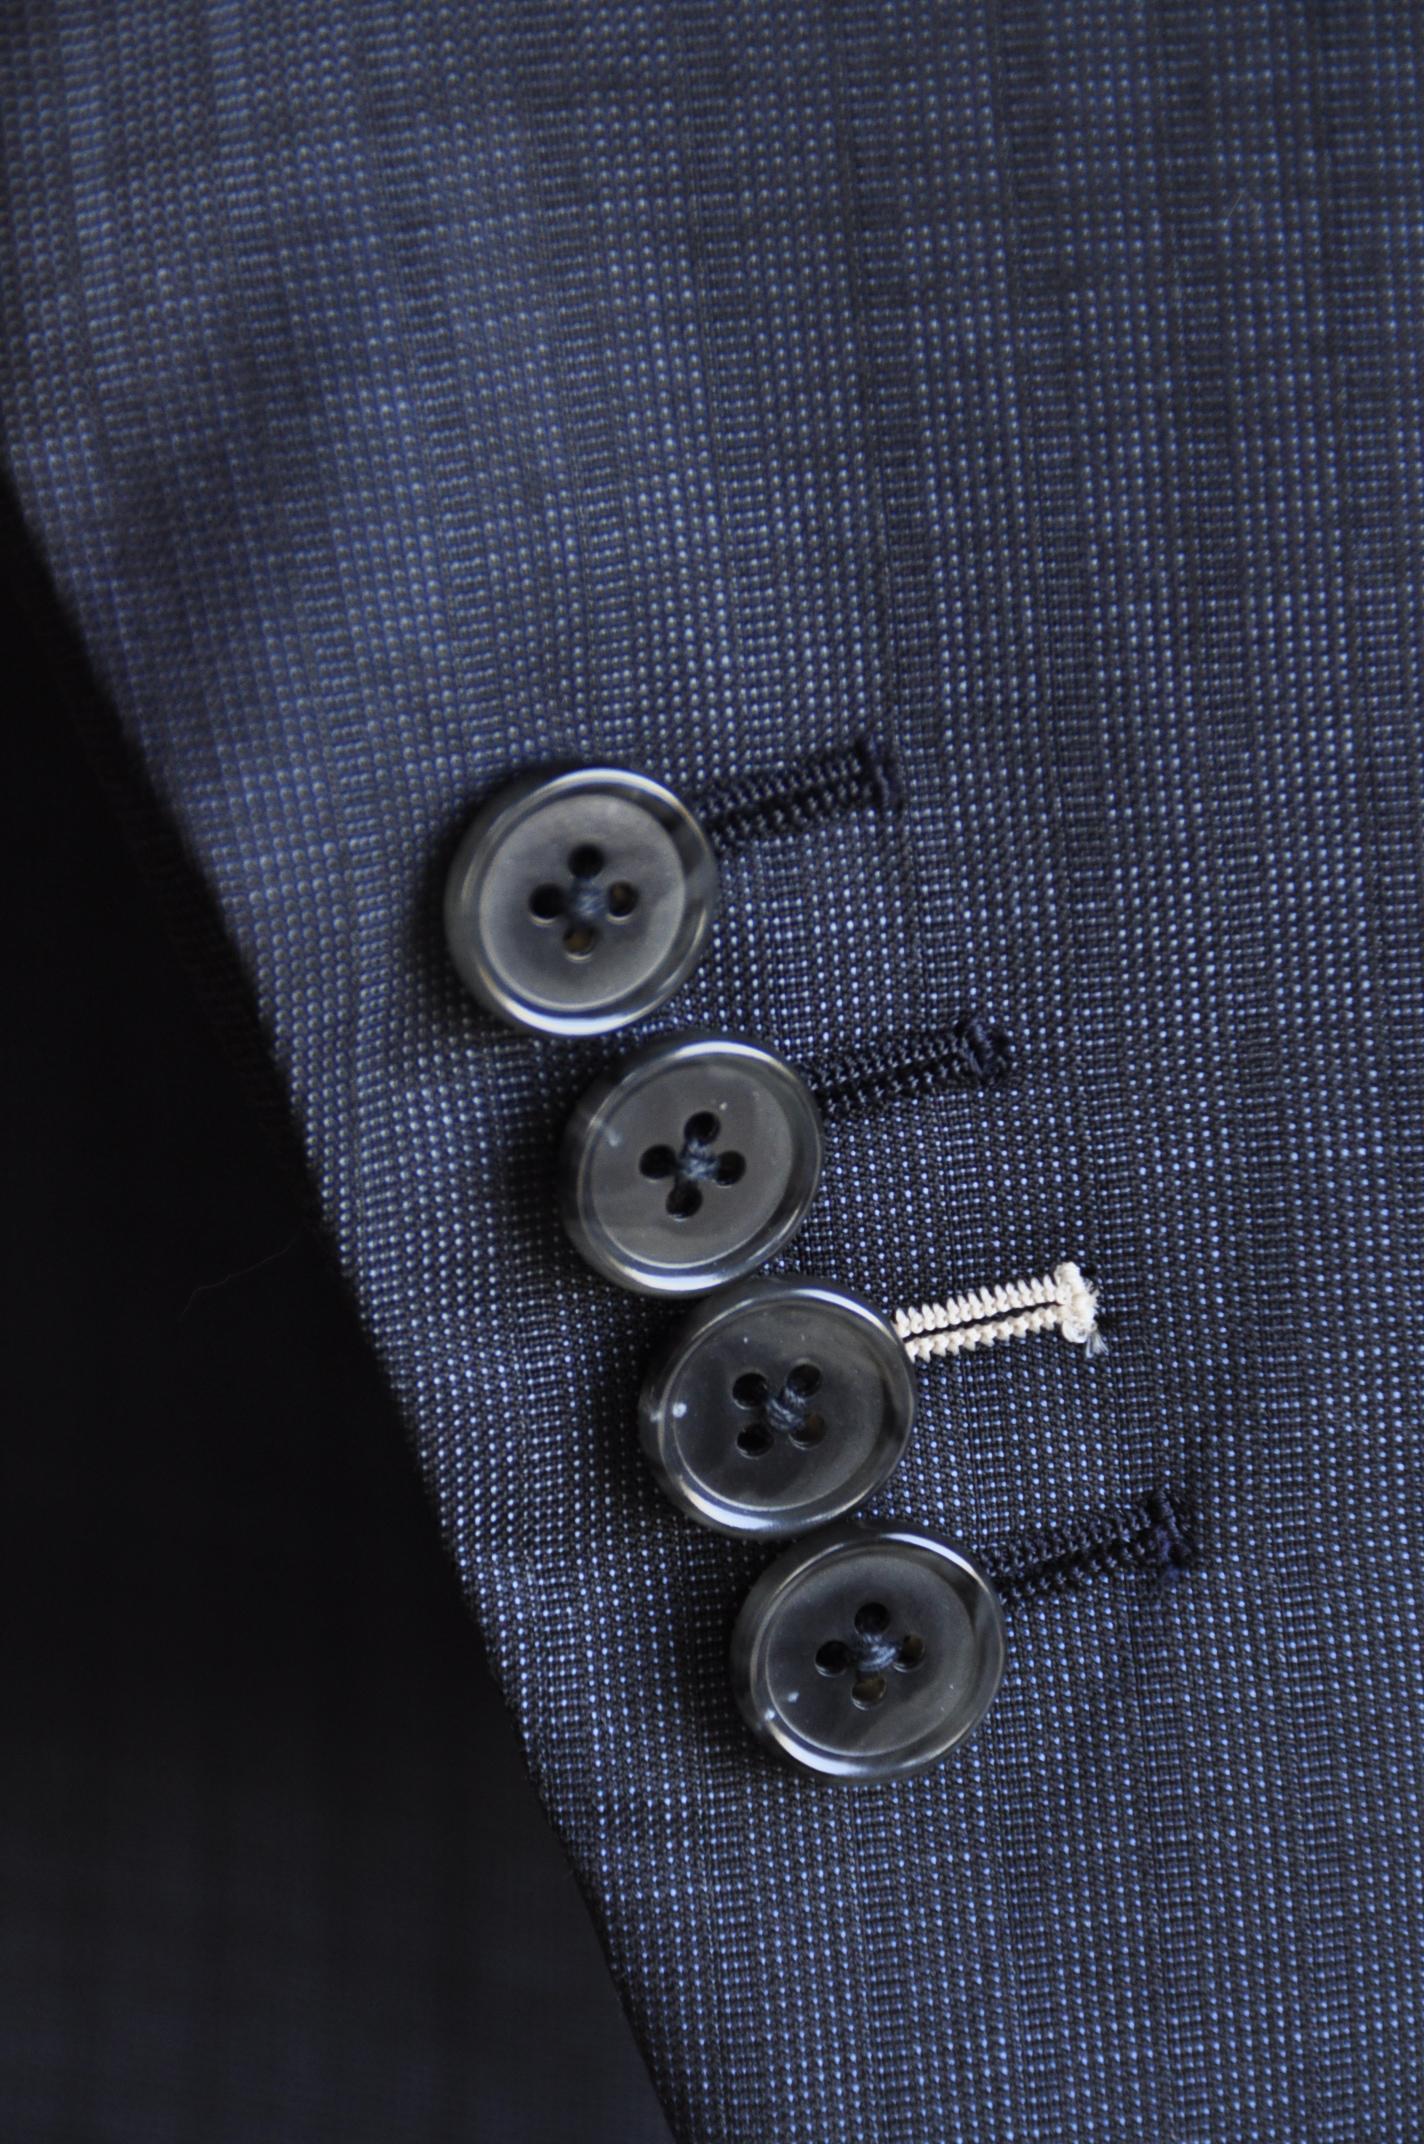 DSC11672 ボタンホール糸色変更 名古屋の完全予約制オーダースーツ専門店DEFFERT